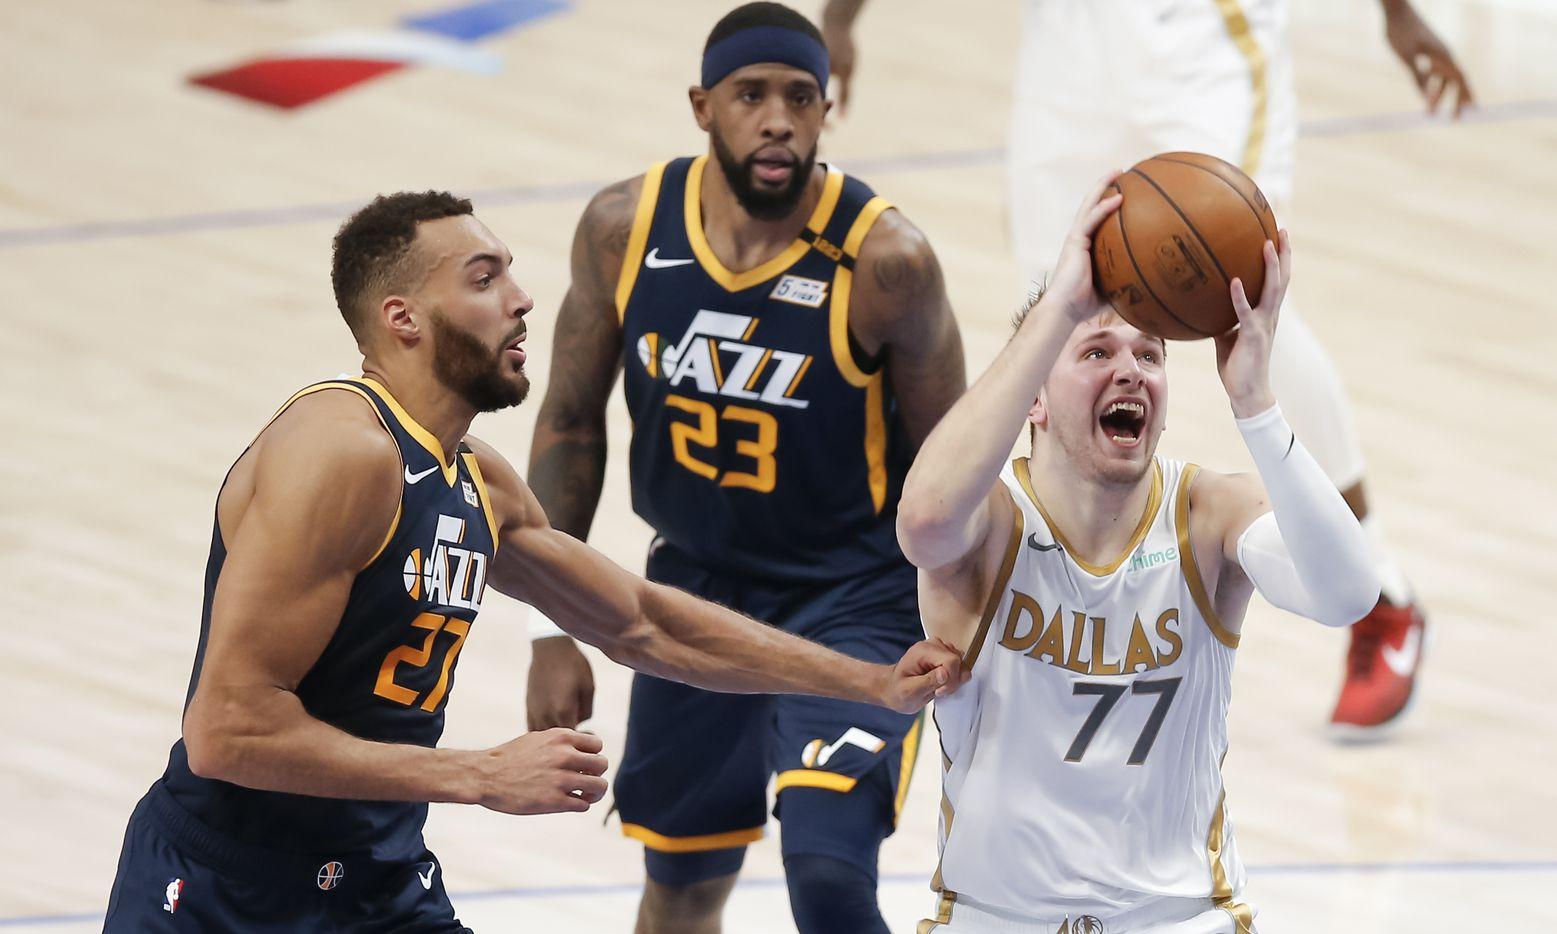 Dallas Mavericks guard Luka Doncic (77) attempts a shot as Utah Jazz forward Rudy Gobert (27) defends during the second half of an NBA basketball game in Dallas, Monday, April 5, 2021. (Brandon Wade/Special Contributor)